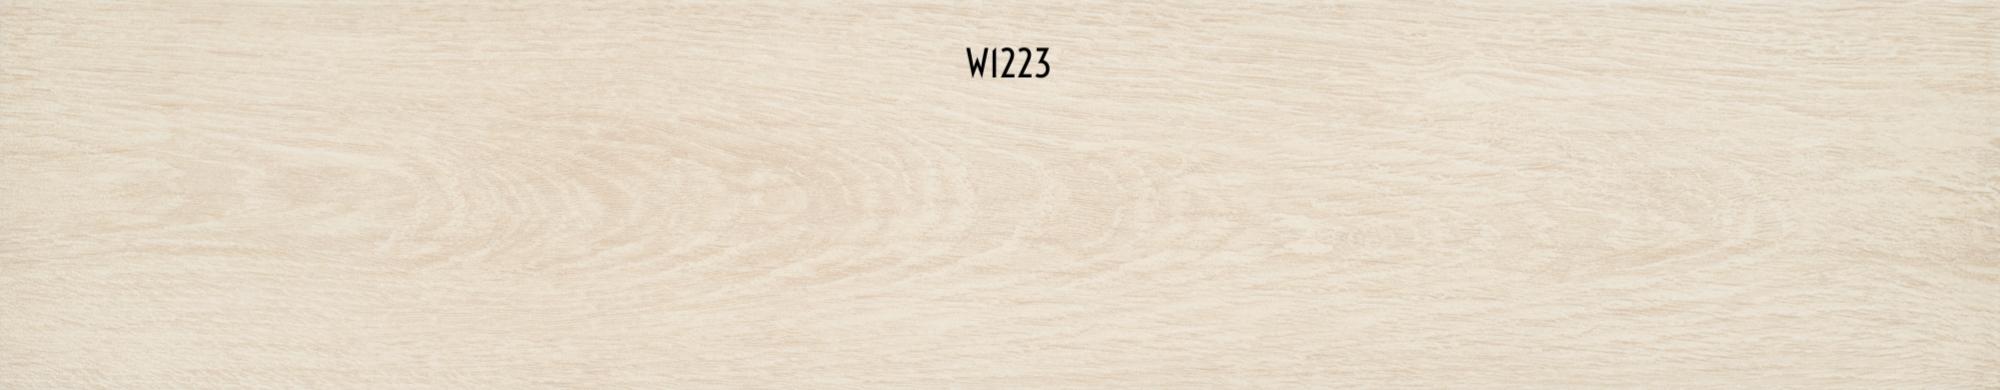 W1223